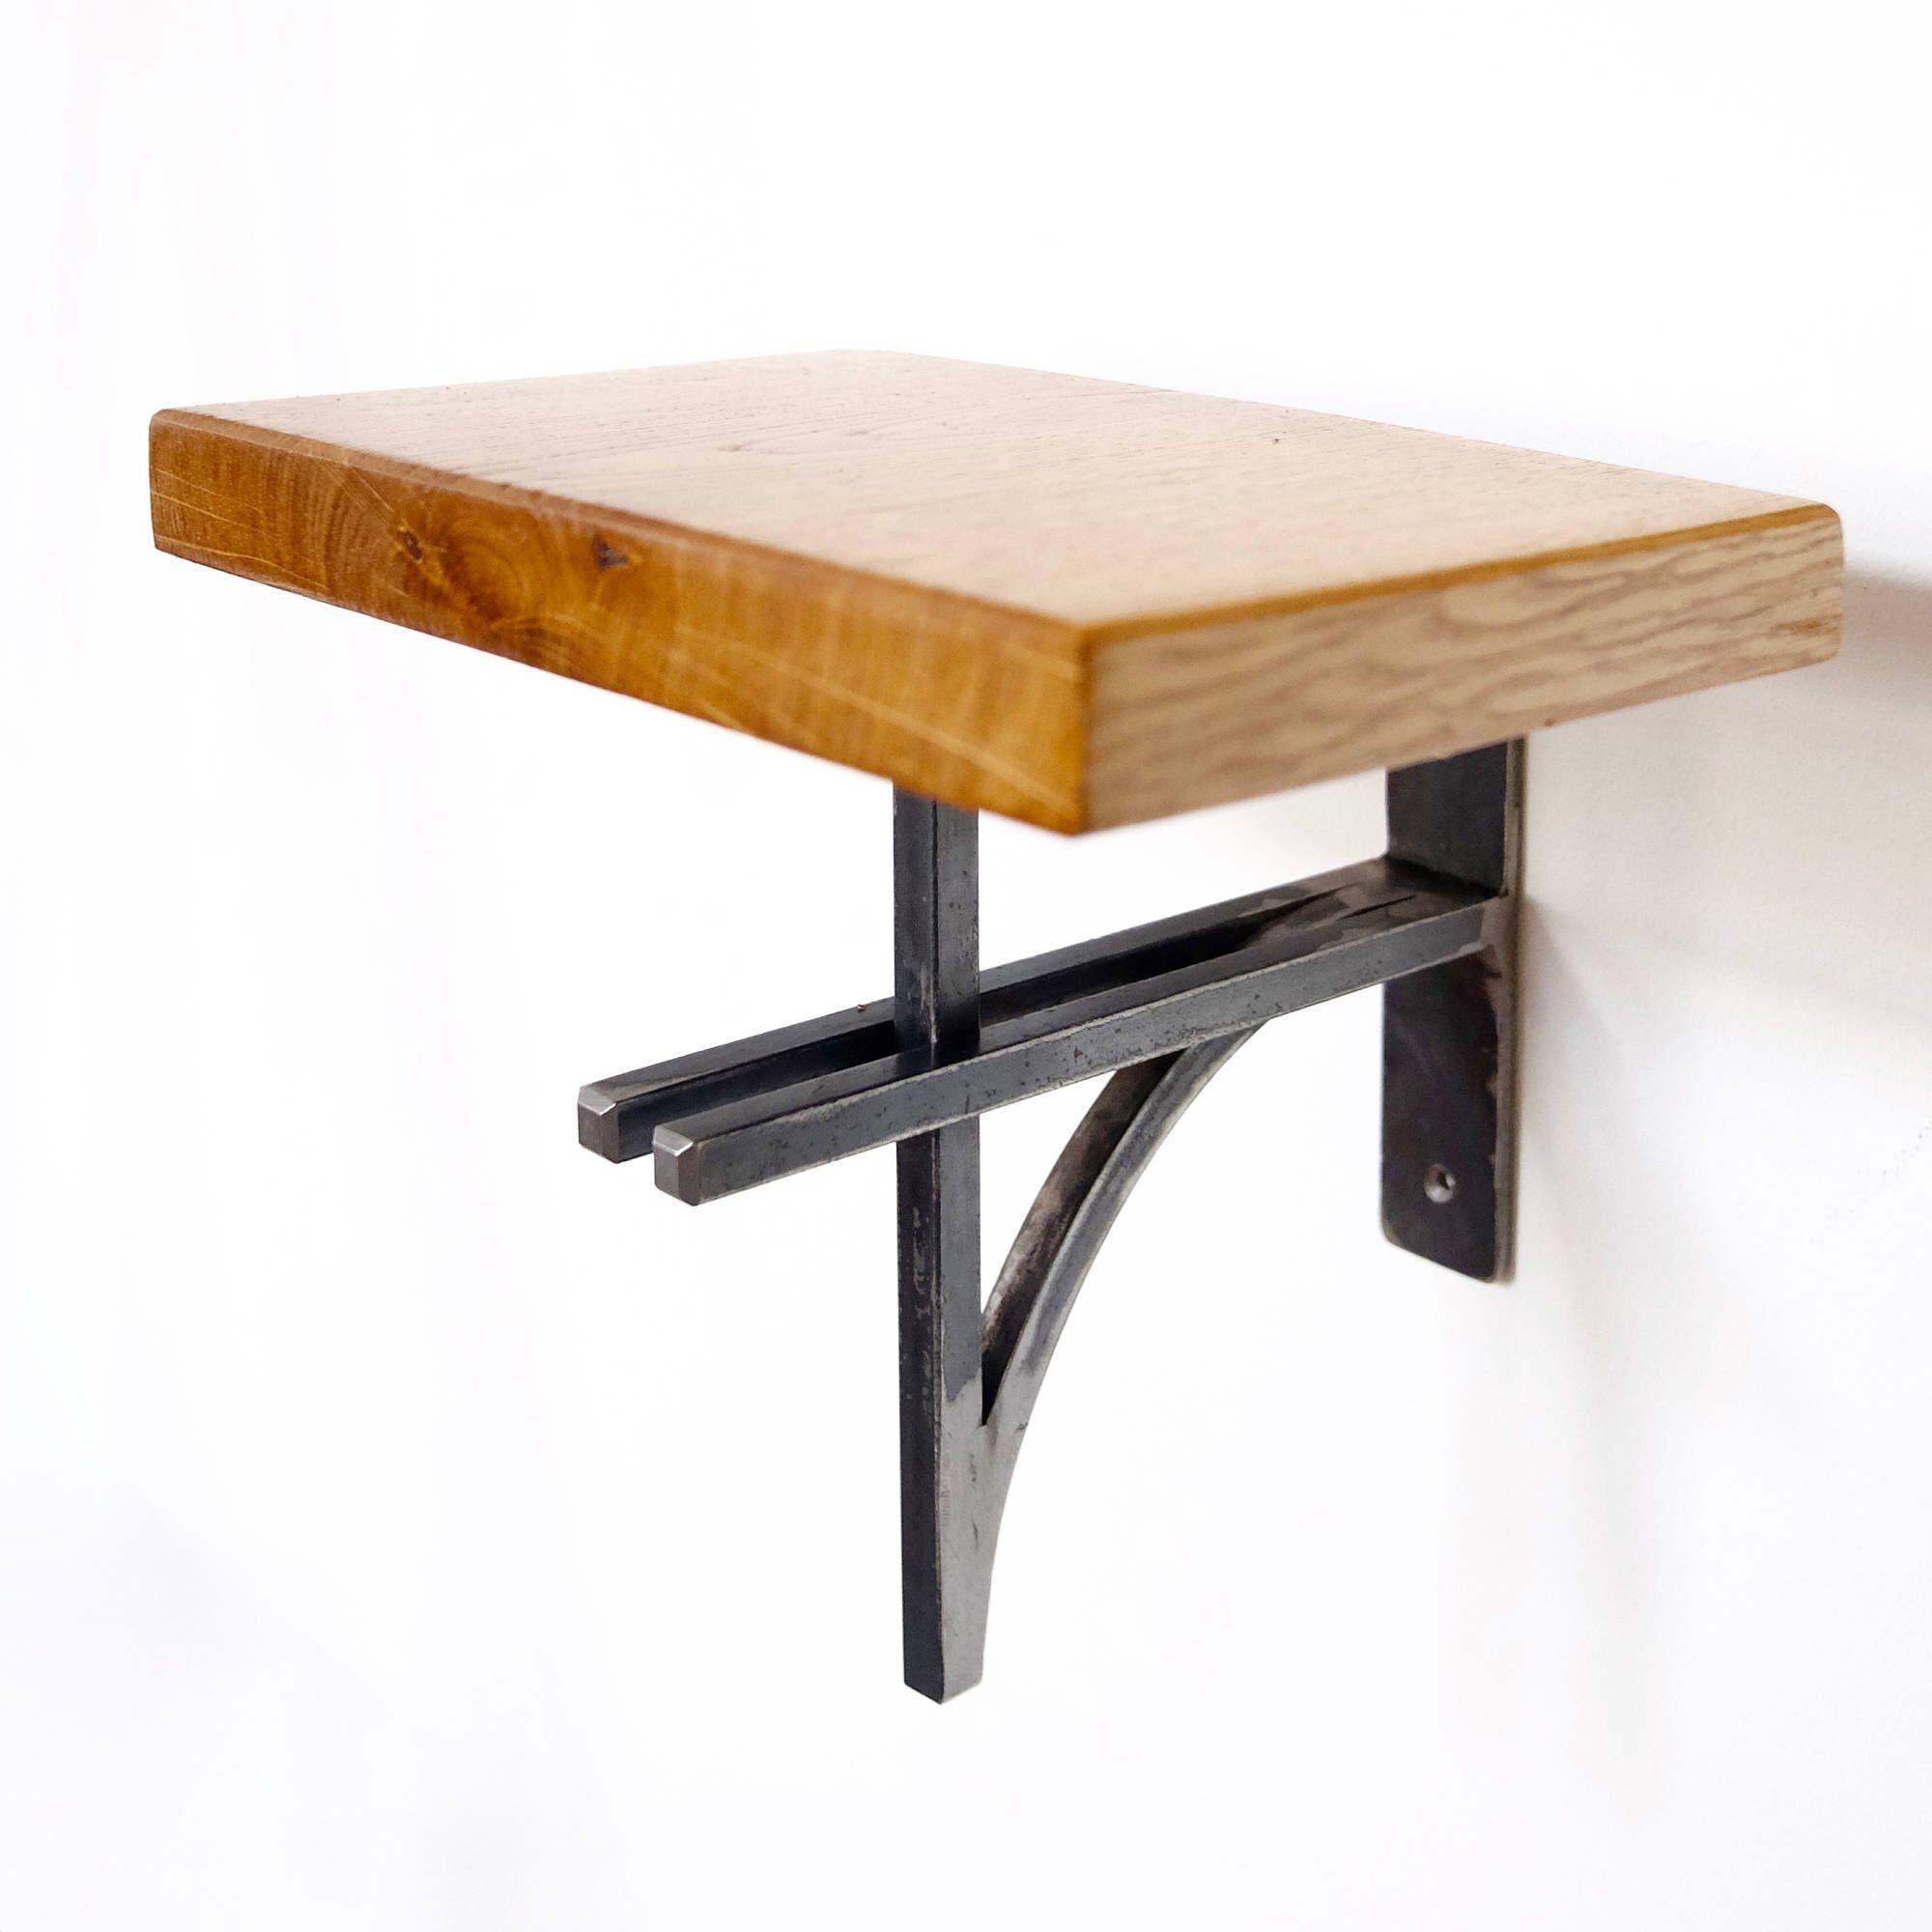 Small Oak Shelf with Steel Bracket - Plant Stand/ Shelving - Modern Industrial Chic, Handmade by escafell on Etsy https://www.etsy.com/uk/listing/526750701/small-oak-shelf-with-steel-bracket-plant